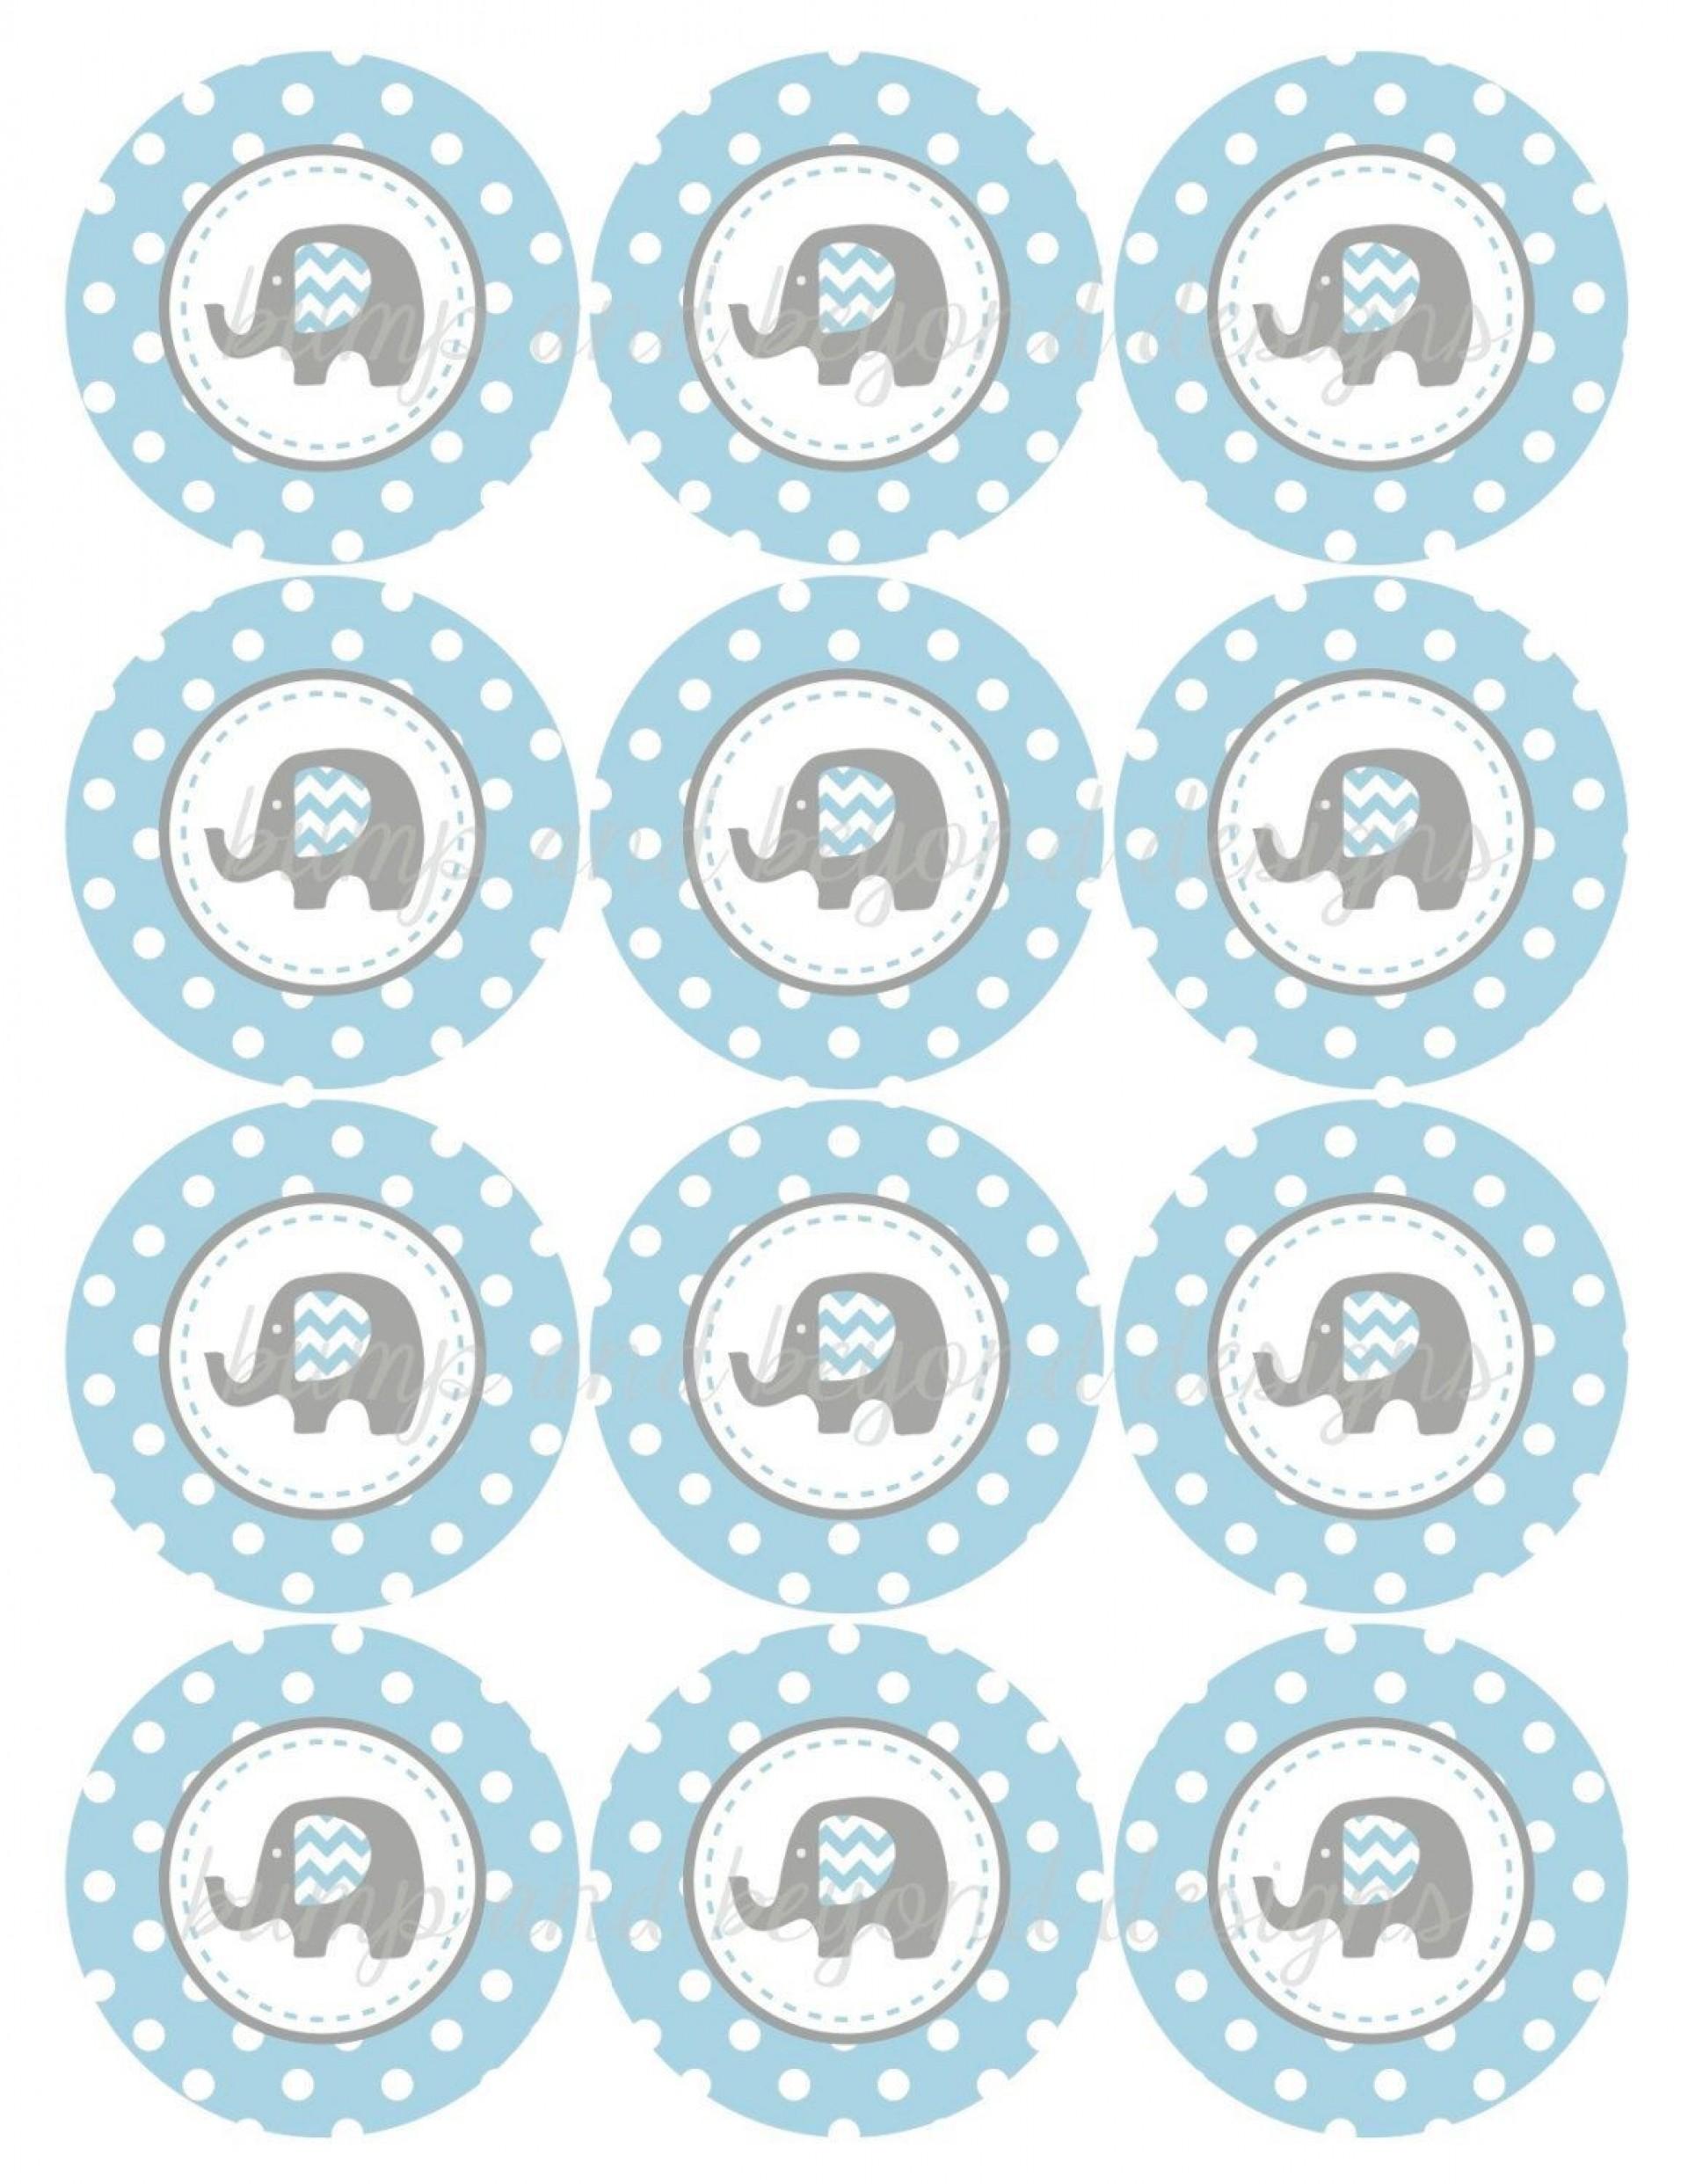 000 Stirring Free Baby Shower Printable Elephant Highest Quality  Decoration1920